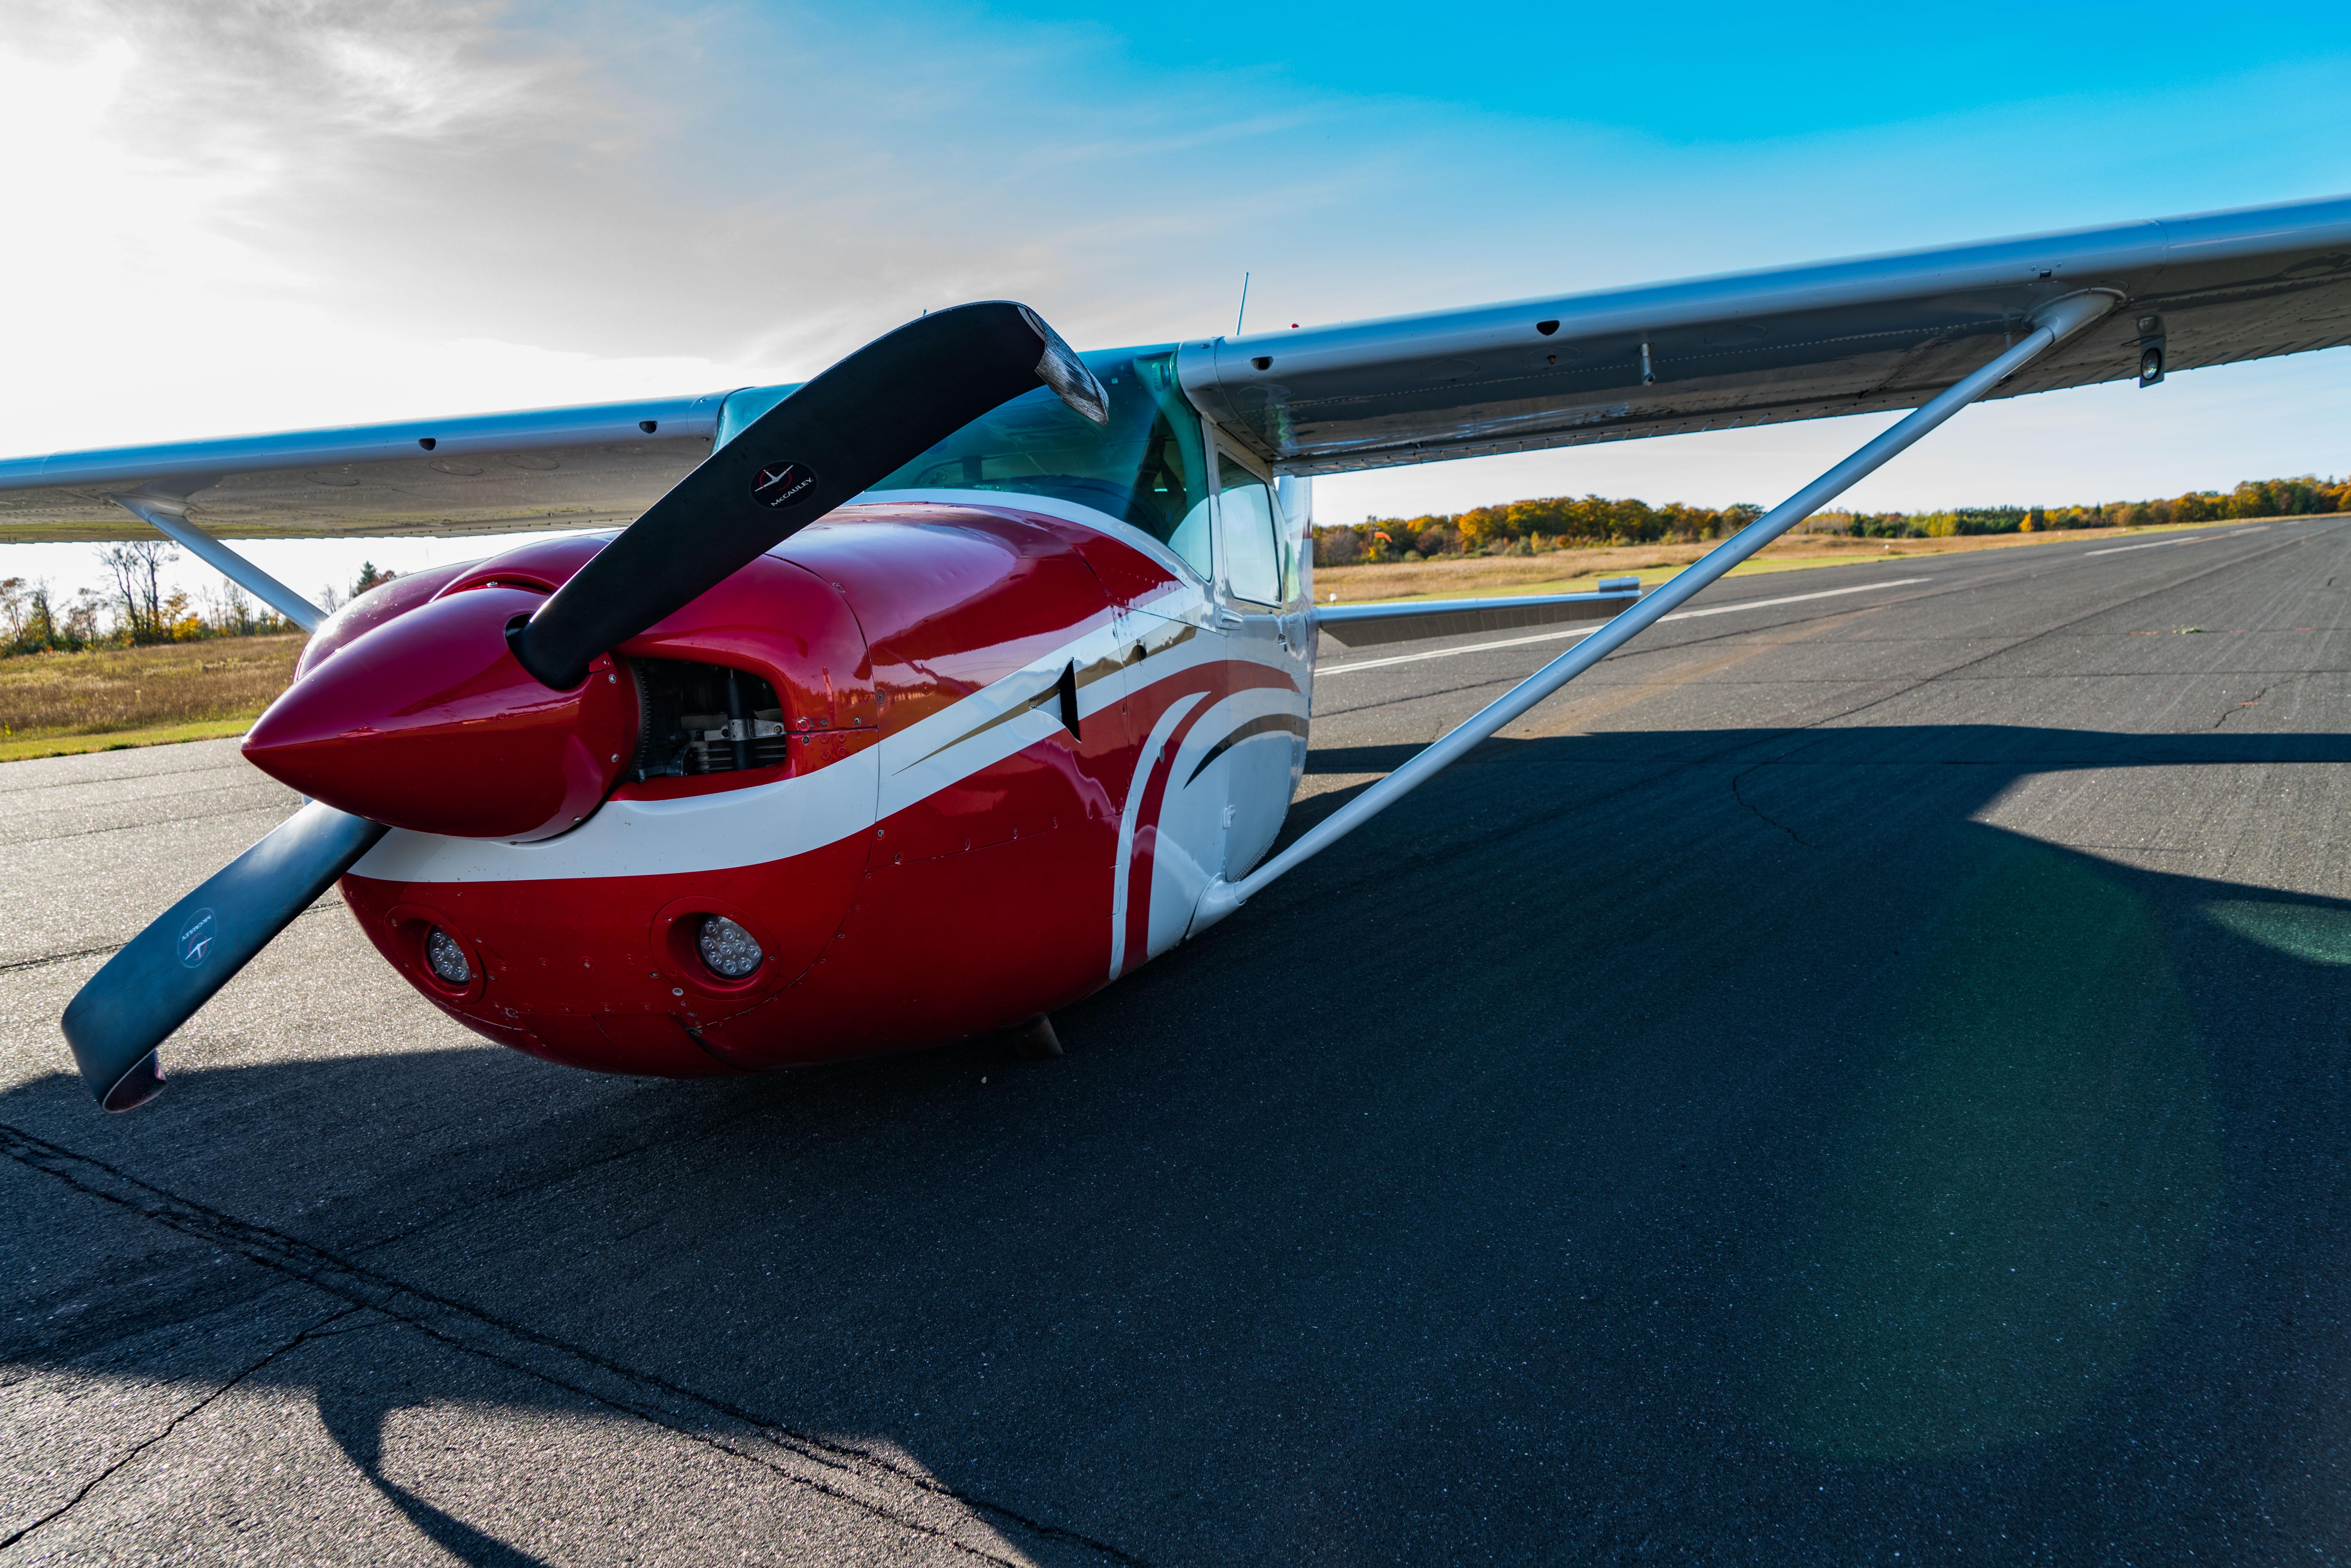 Best episodes of AviatorCast: Flight Training & Aviation